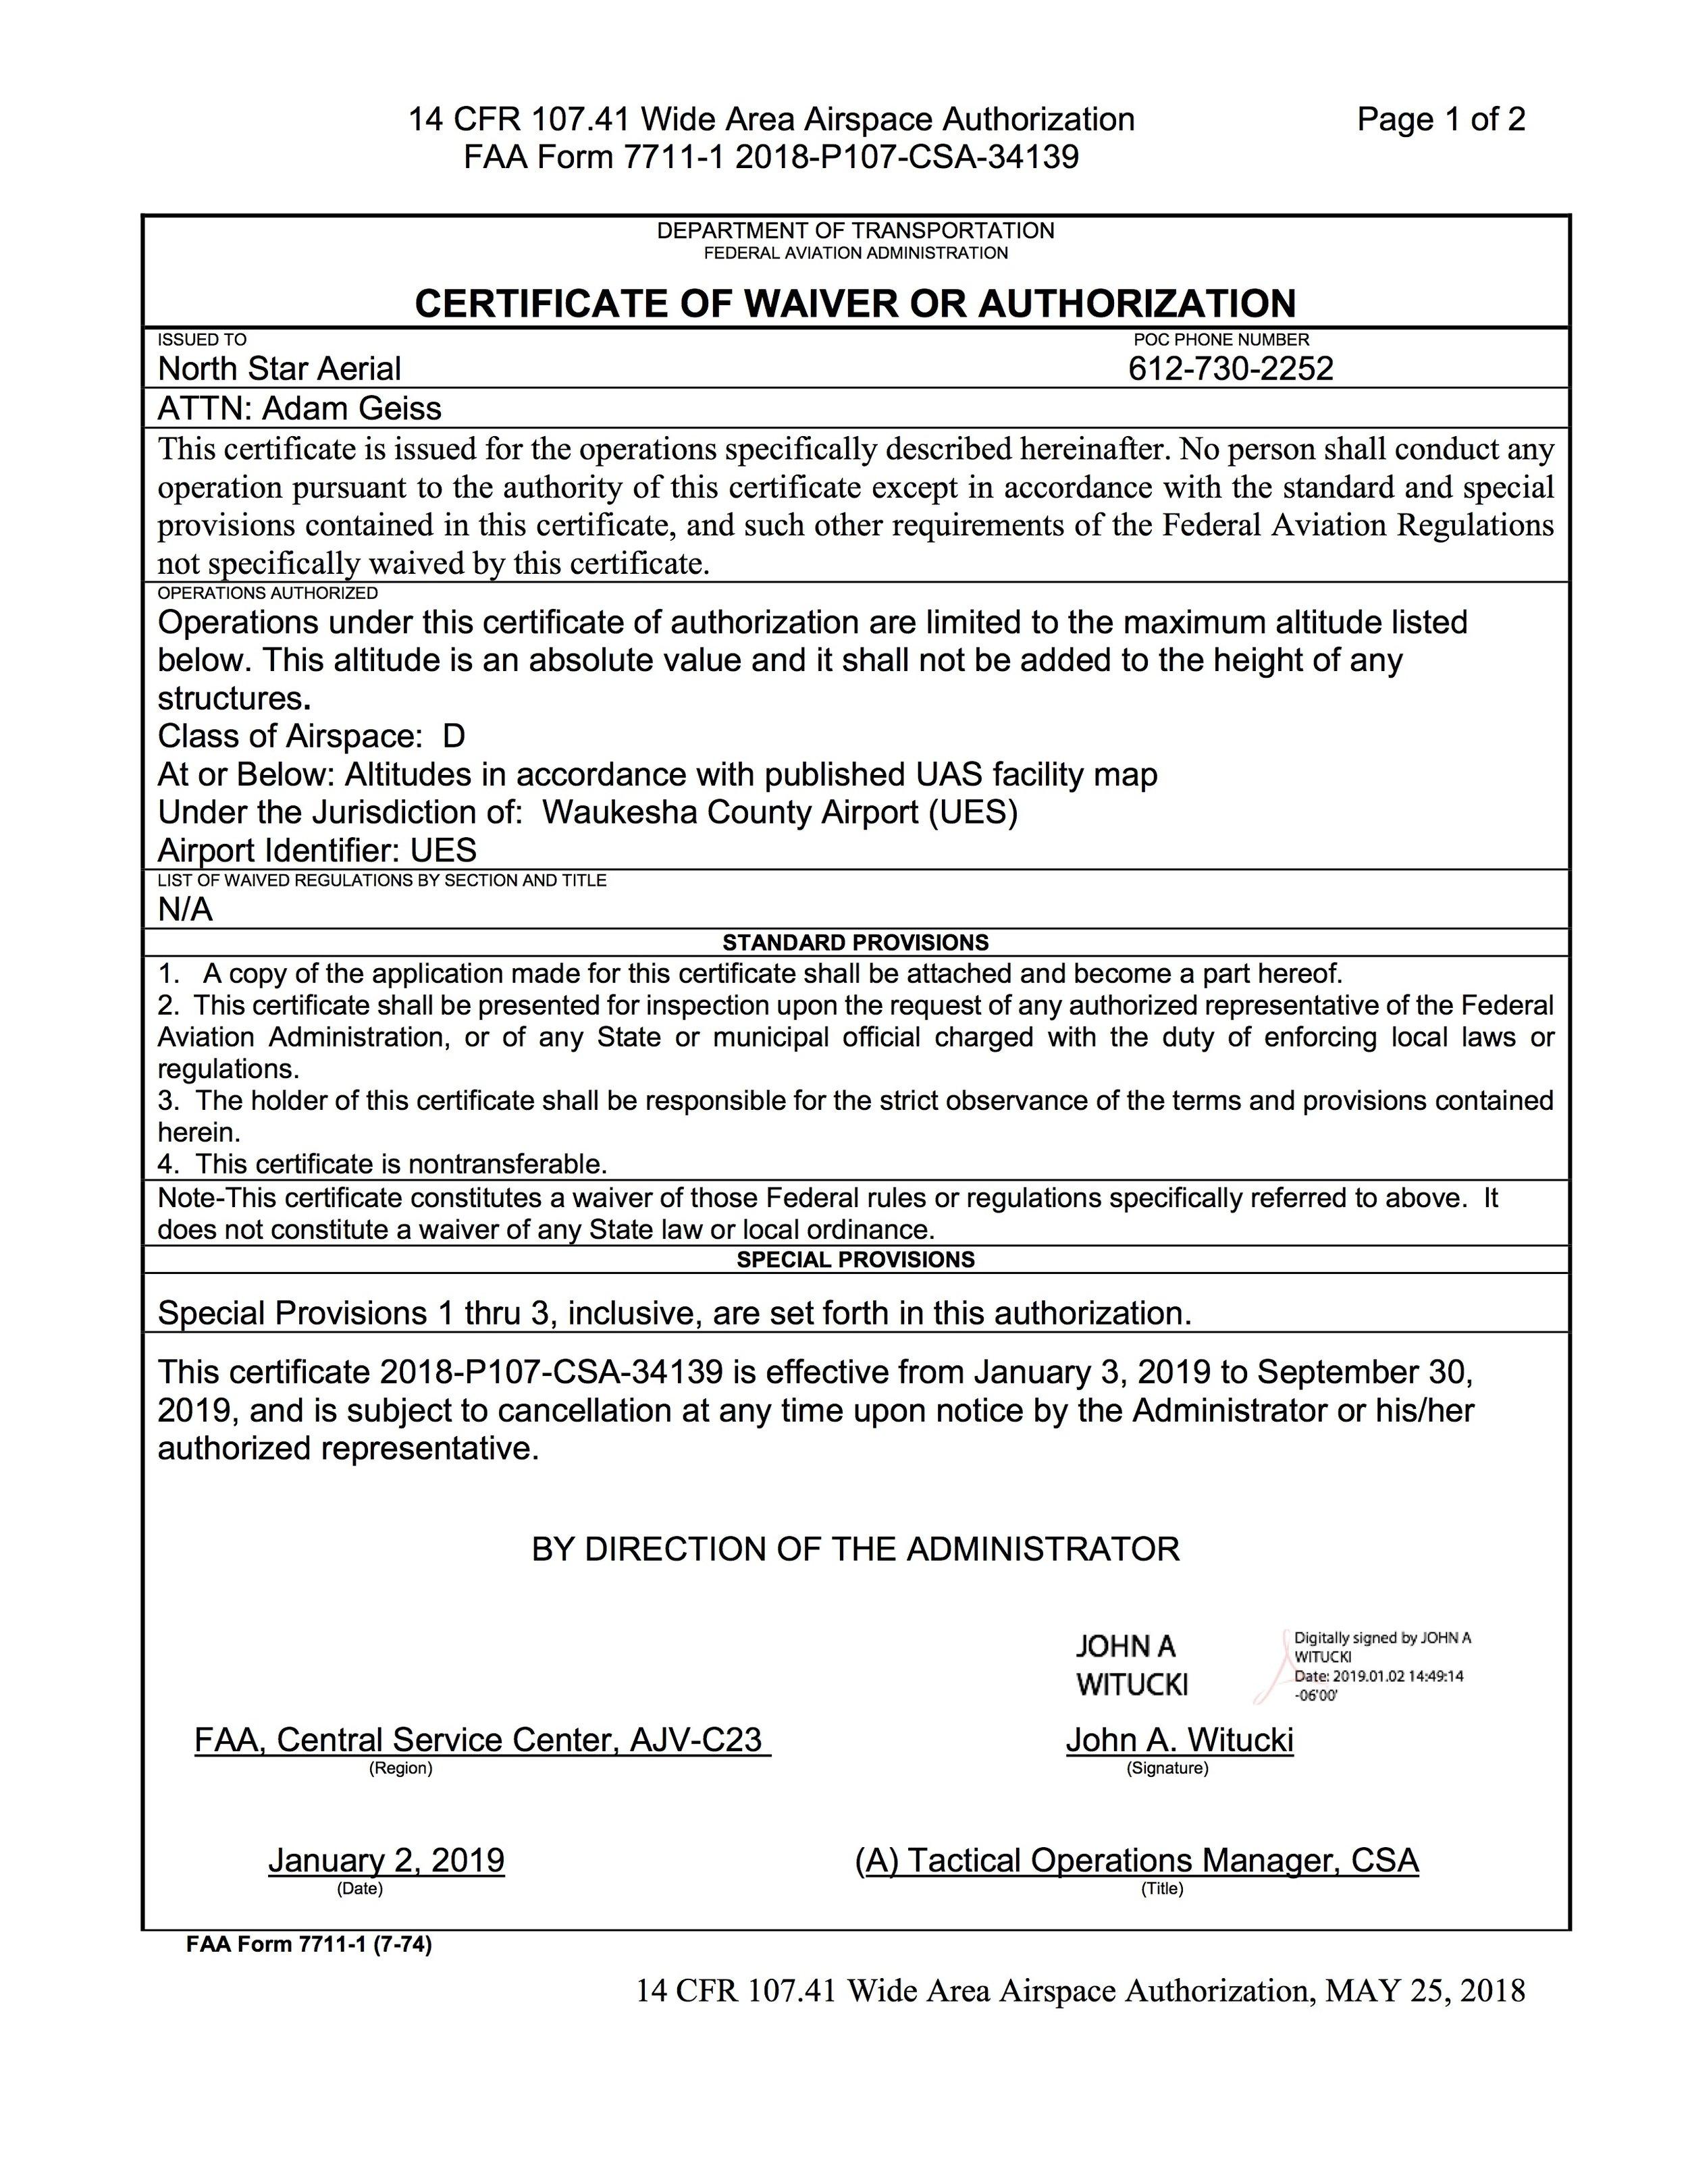 FAA Form 7711-1 2018-P107-CSA-34139 UES.jpg